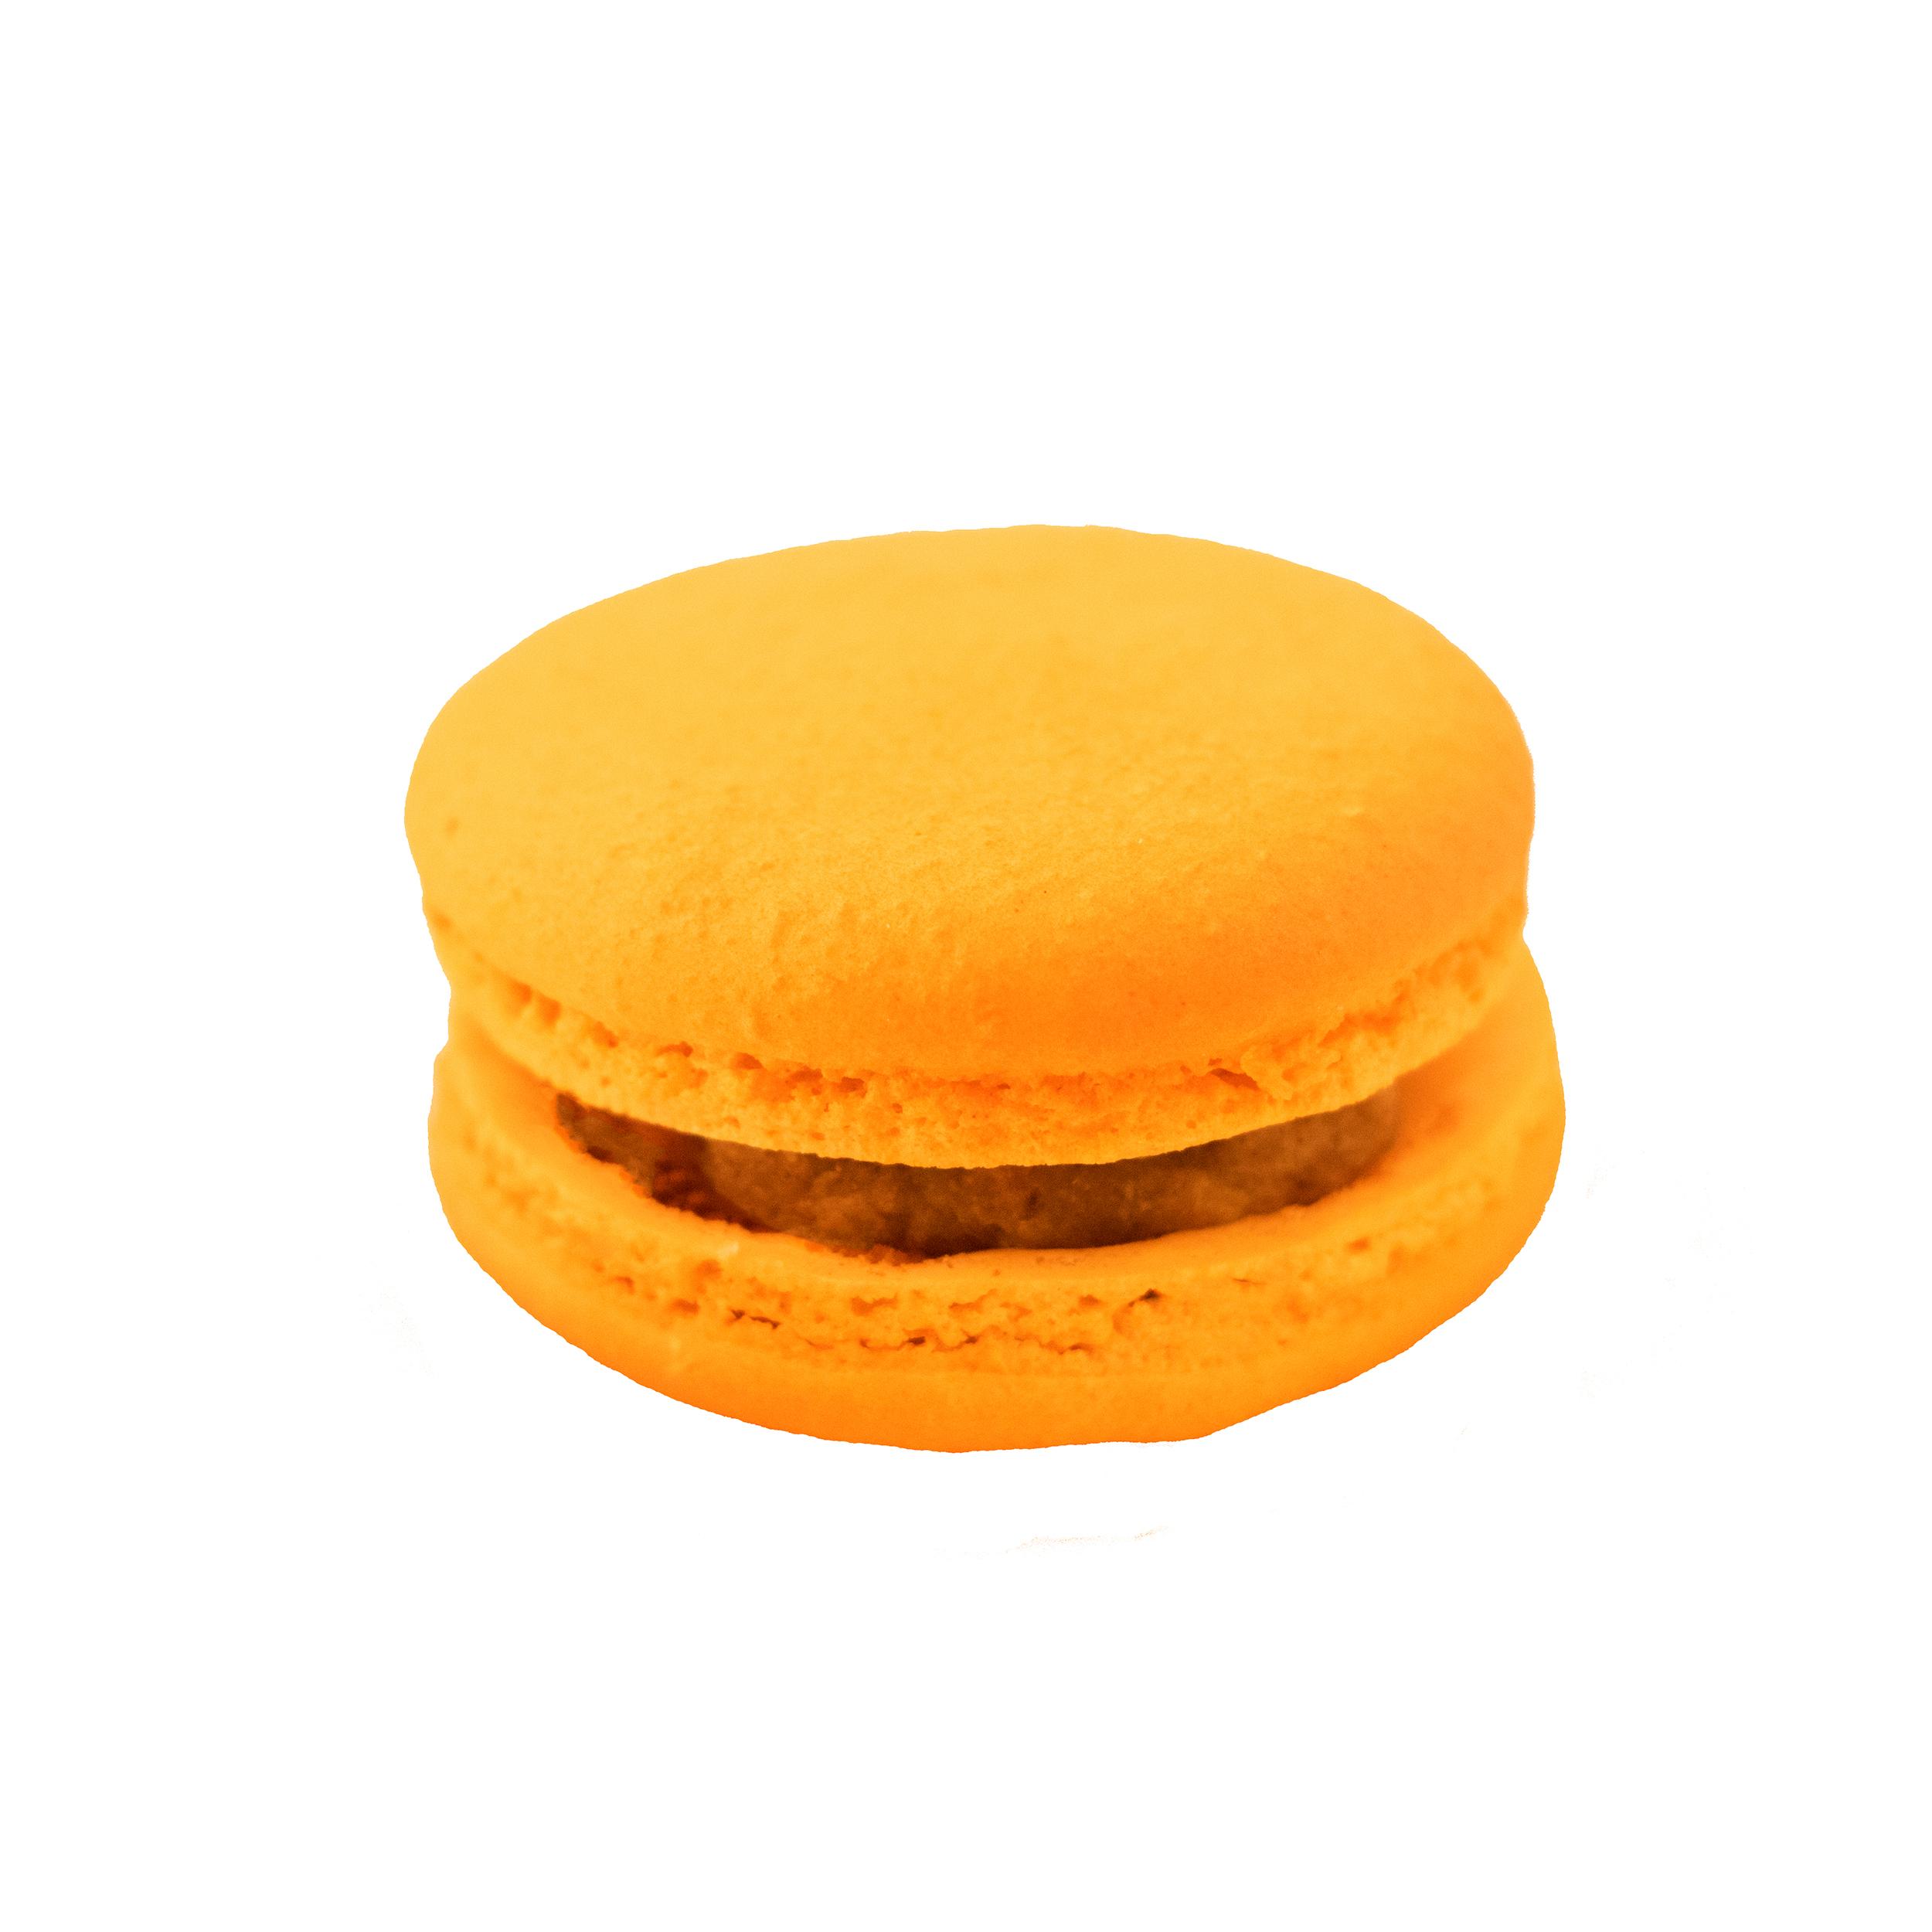 Carrot Cake Macaron.jpg